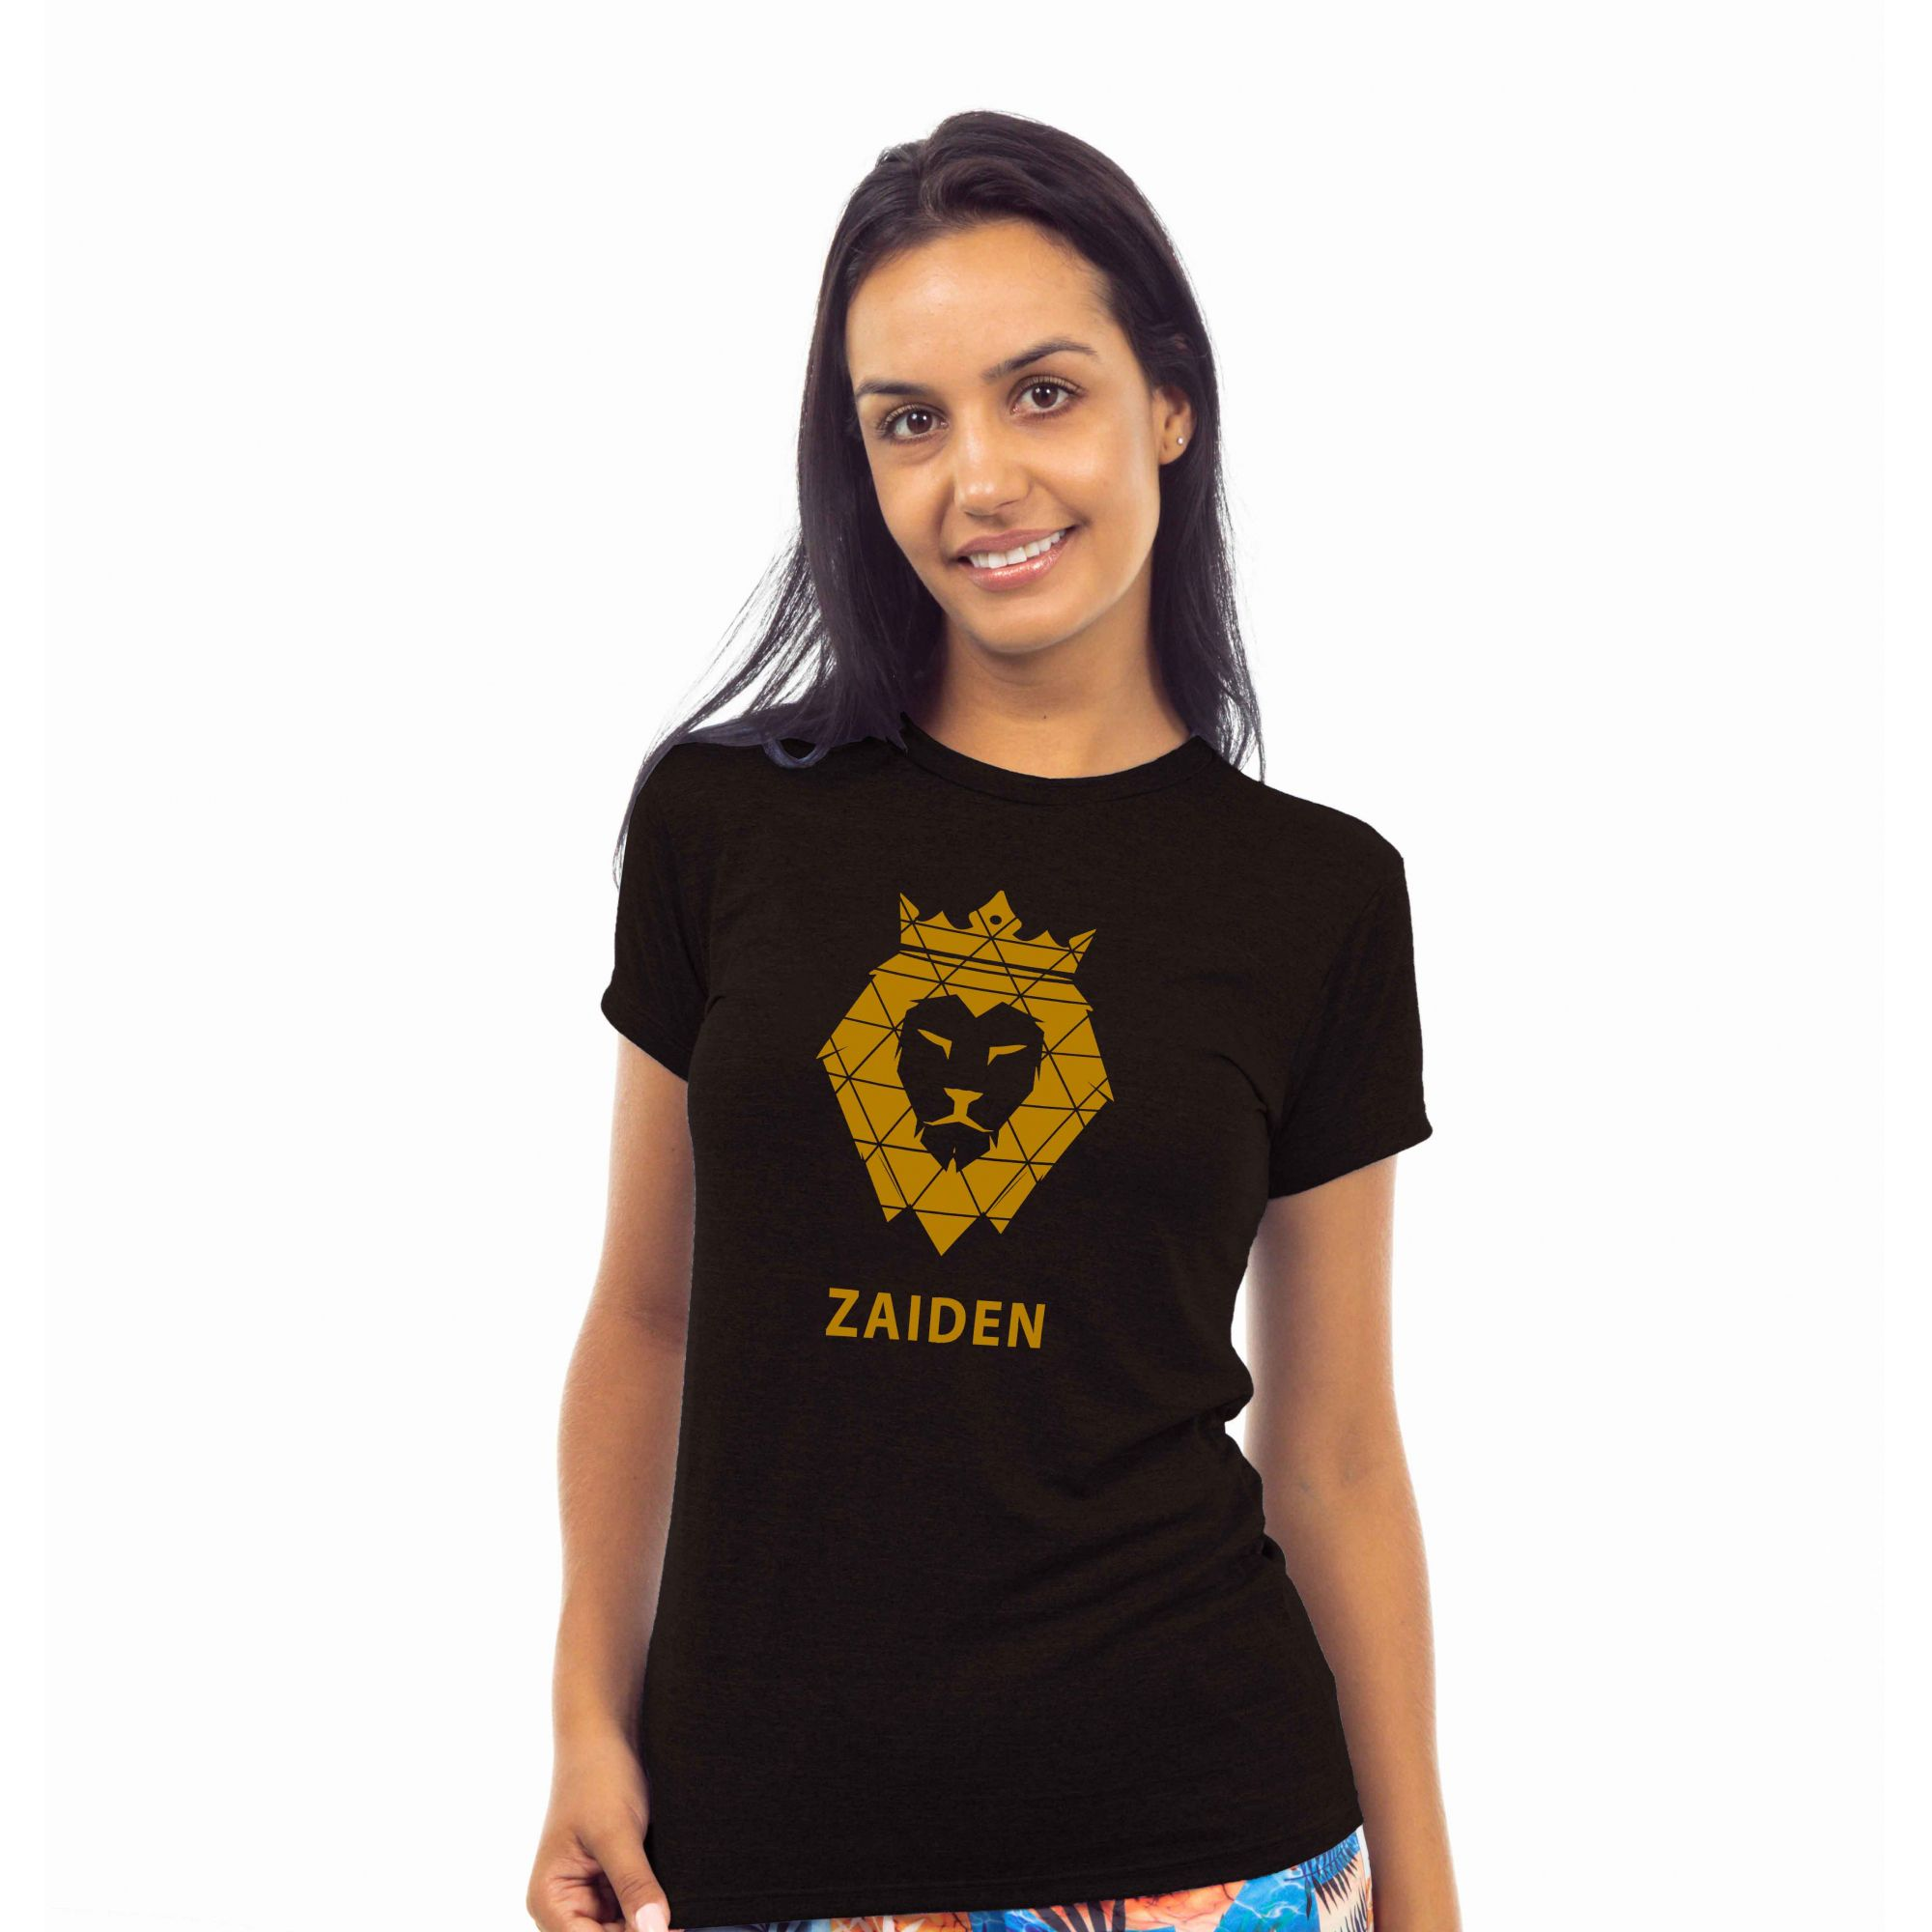 Camiseta Feminina Poliamida ZAIDEN Preta Leão Dourado